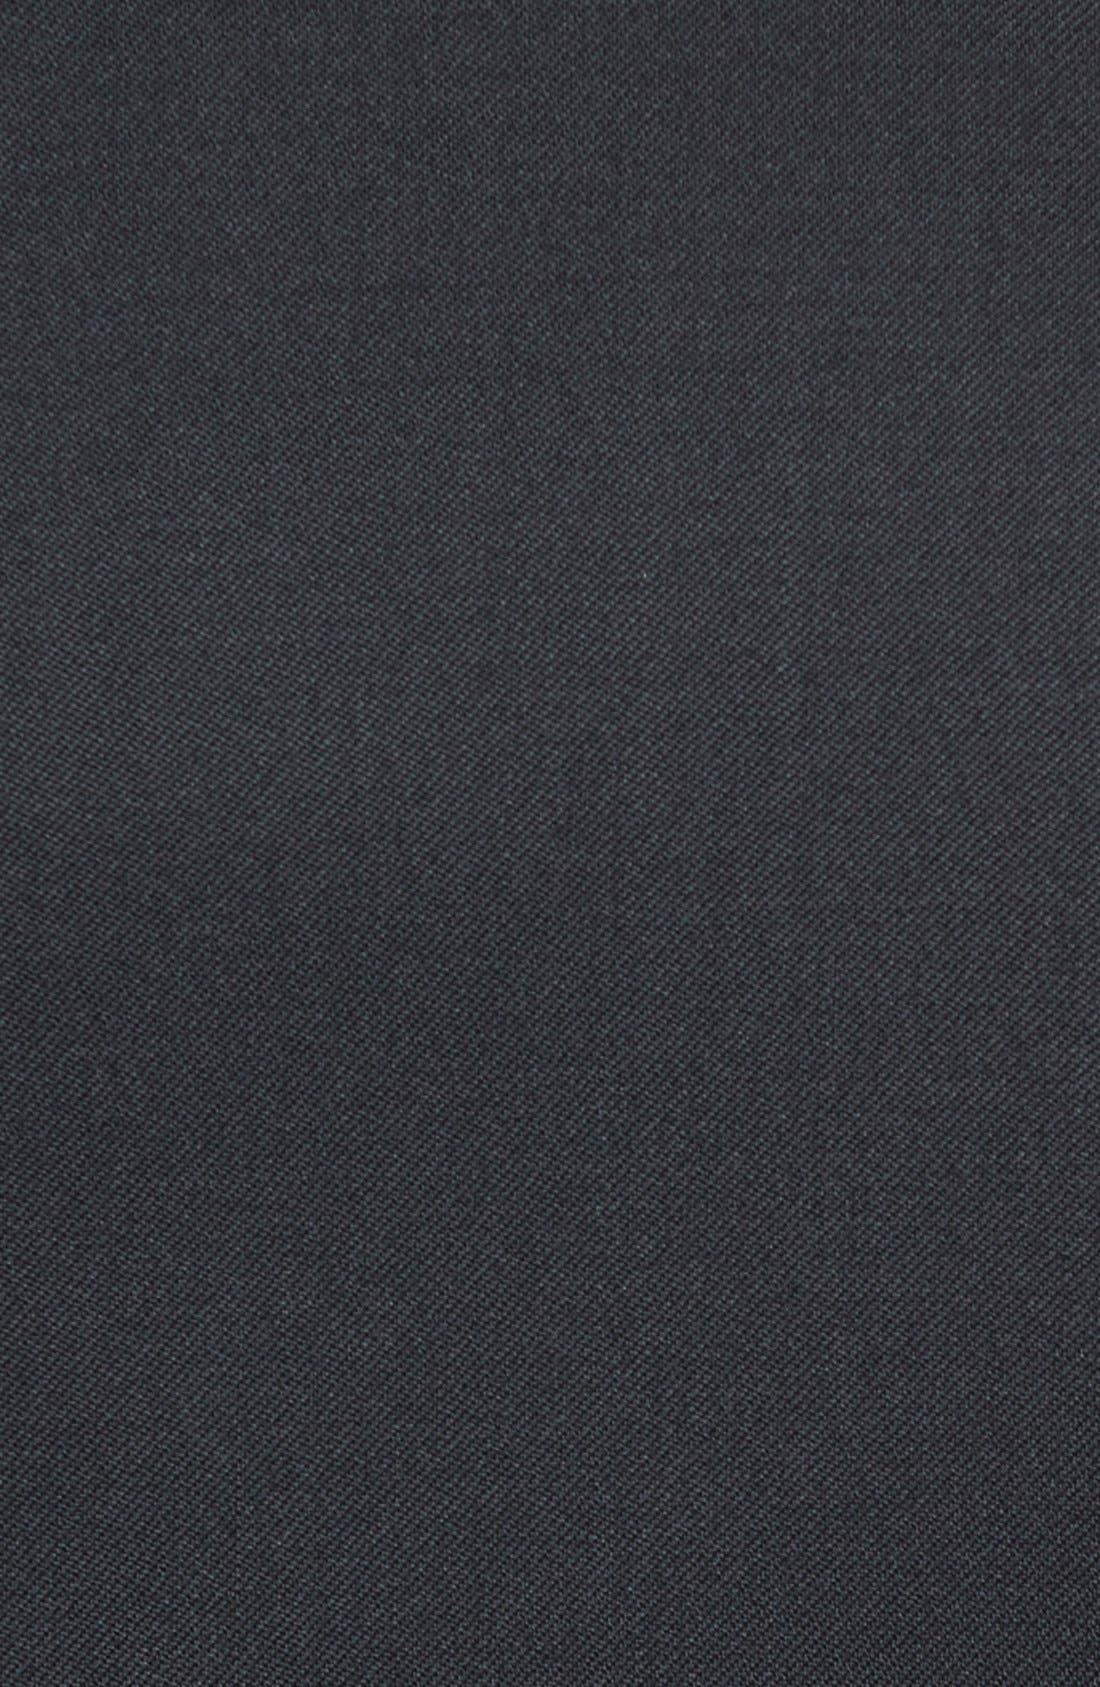 Russell Classic Fit Loro Piana Wool Tuxedo,                             Alternate thumbnail 9, color,                             BLACK